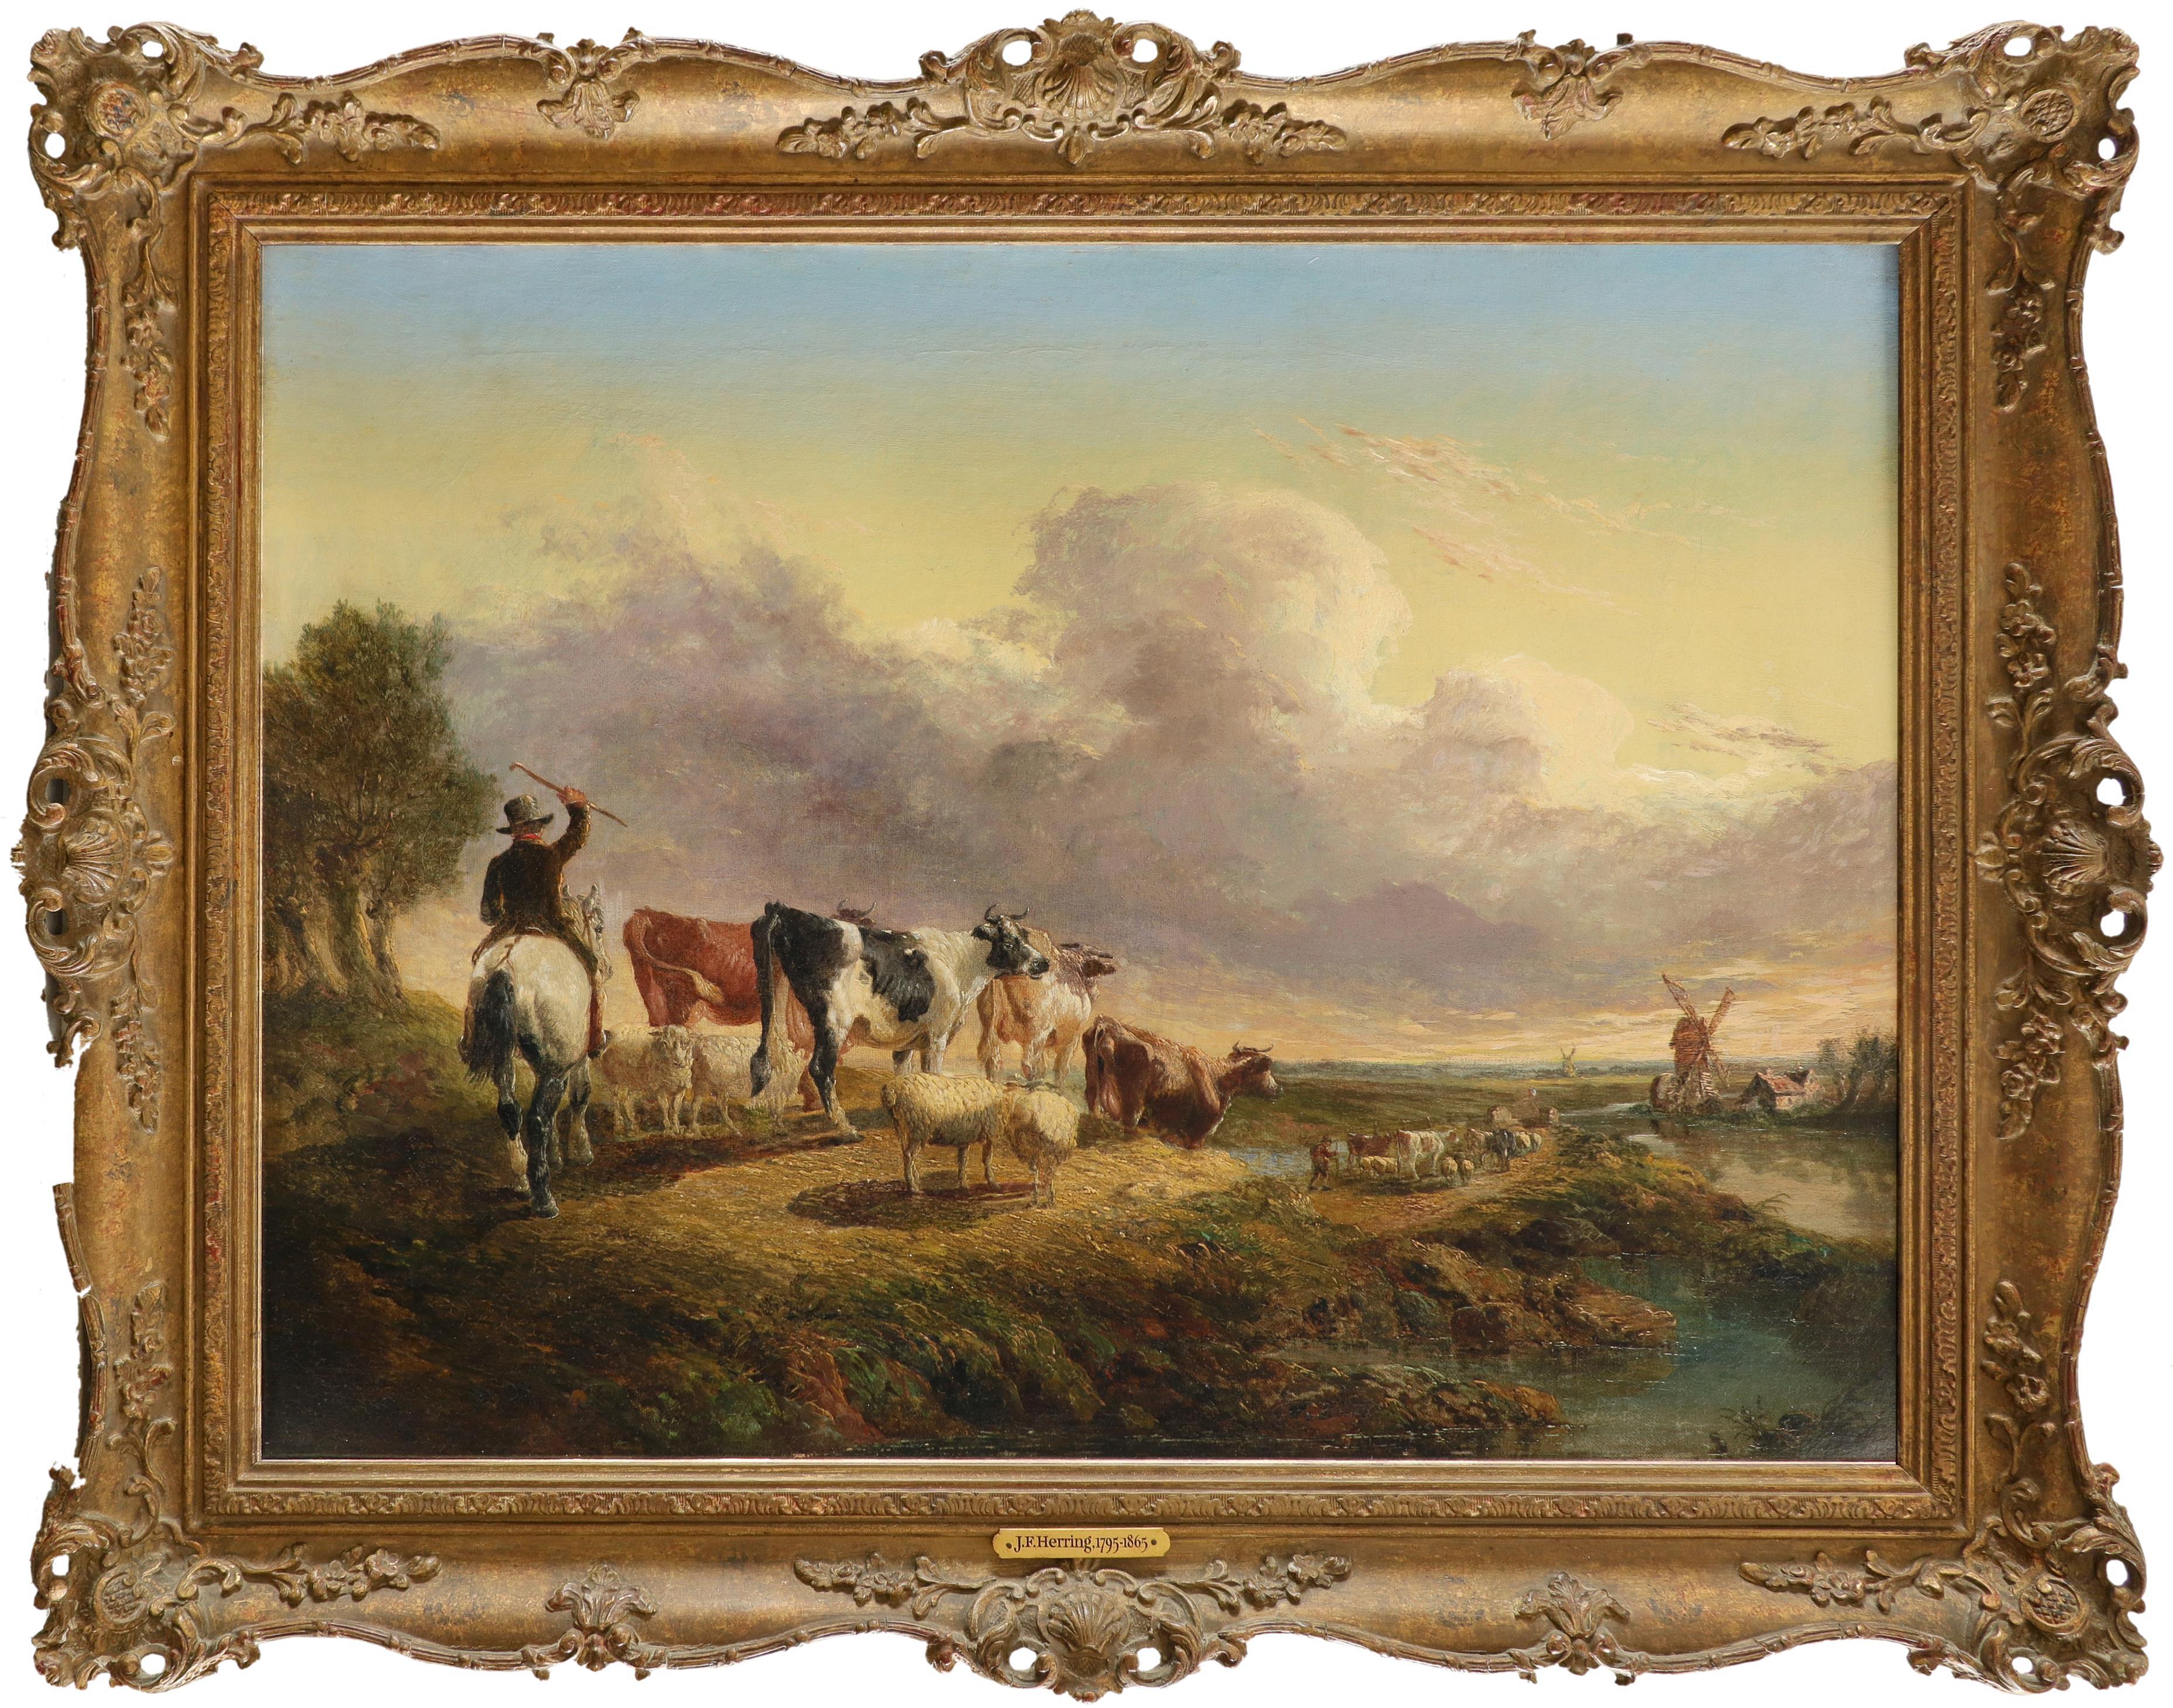 Follower of John Frederick Herring Snr. Taking the flock home at dusk Oil on canvas 44.2 x 59.8cm; - Image 2 of 3